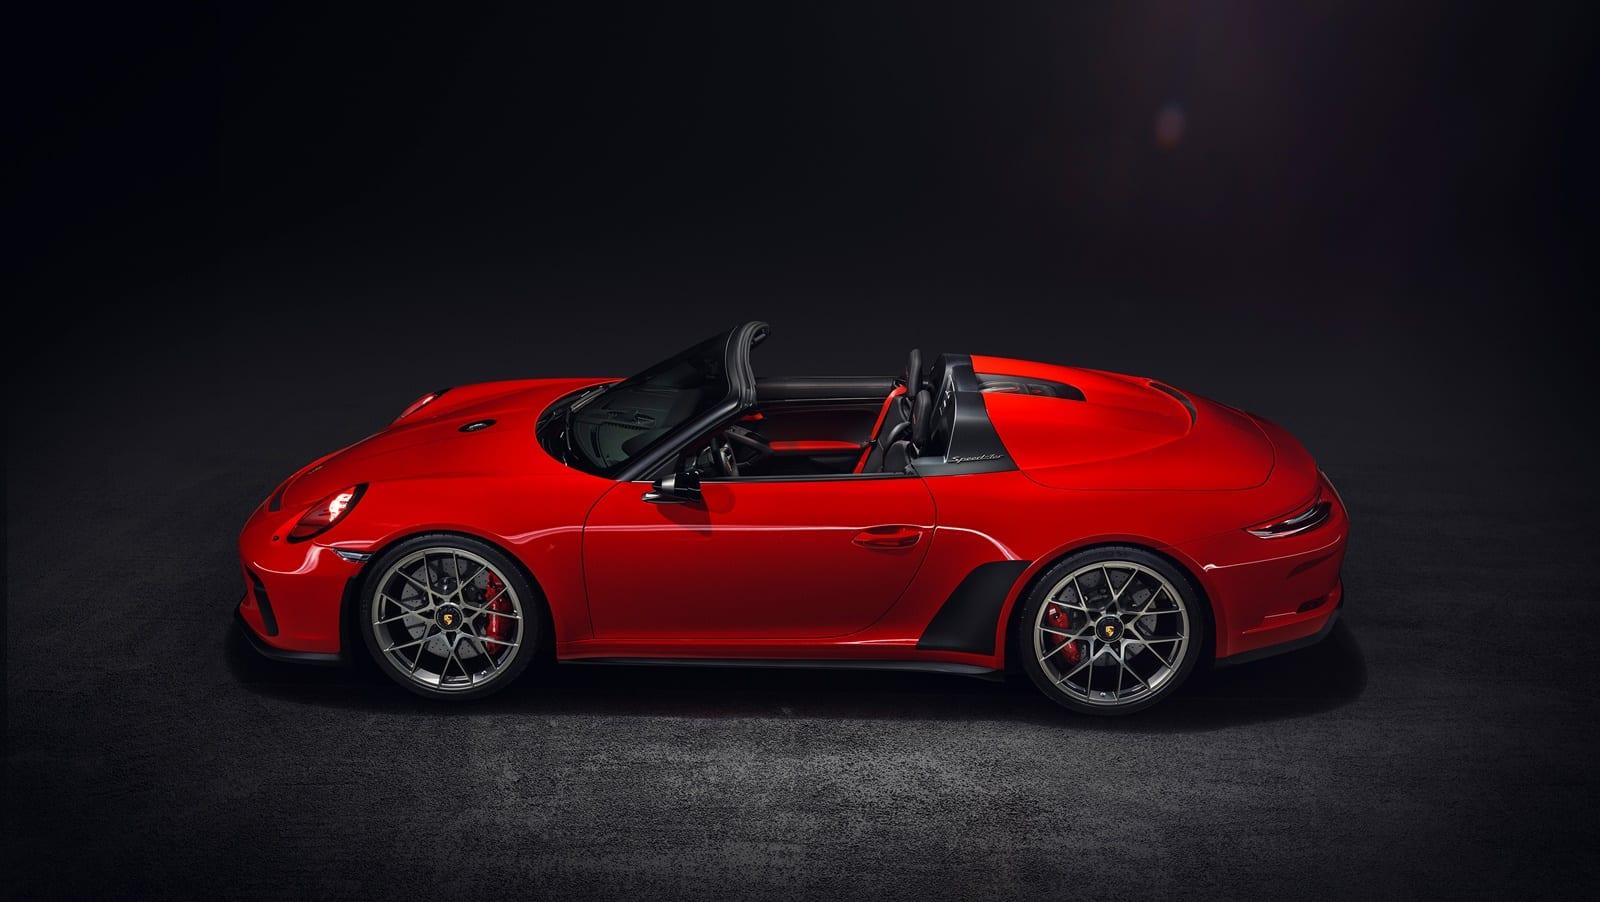 2018 Porsche 911 Gt3 >> El Porsche 911 Speedster llegará a producción en 2019